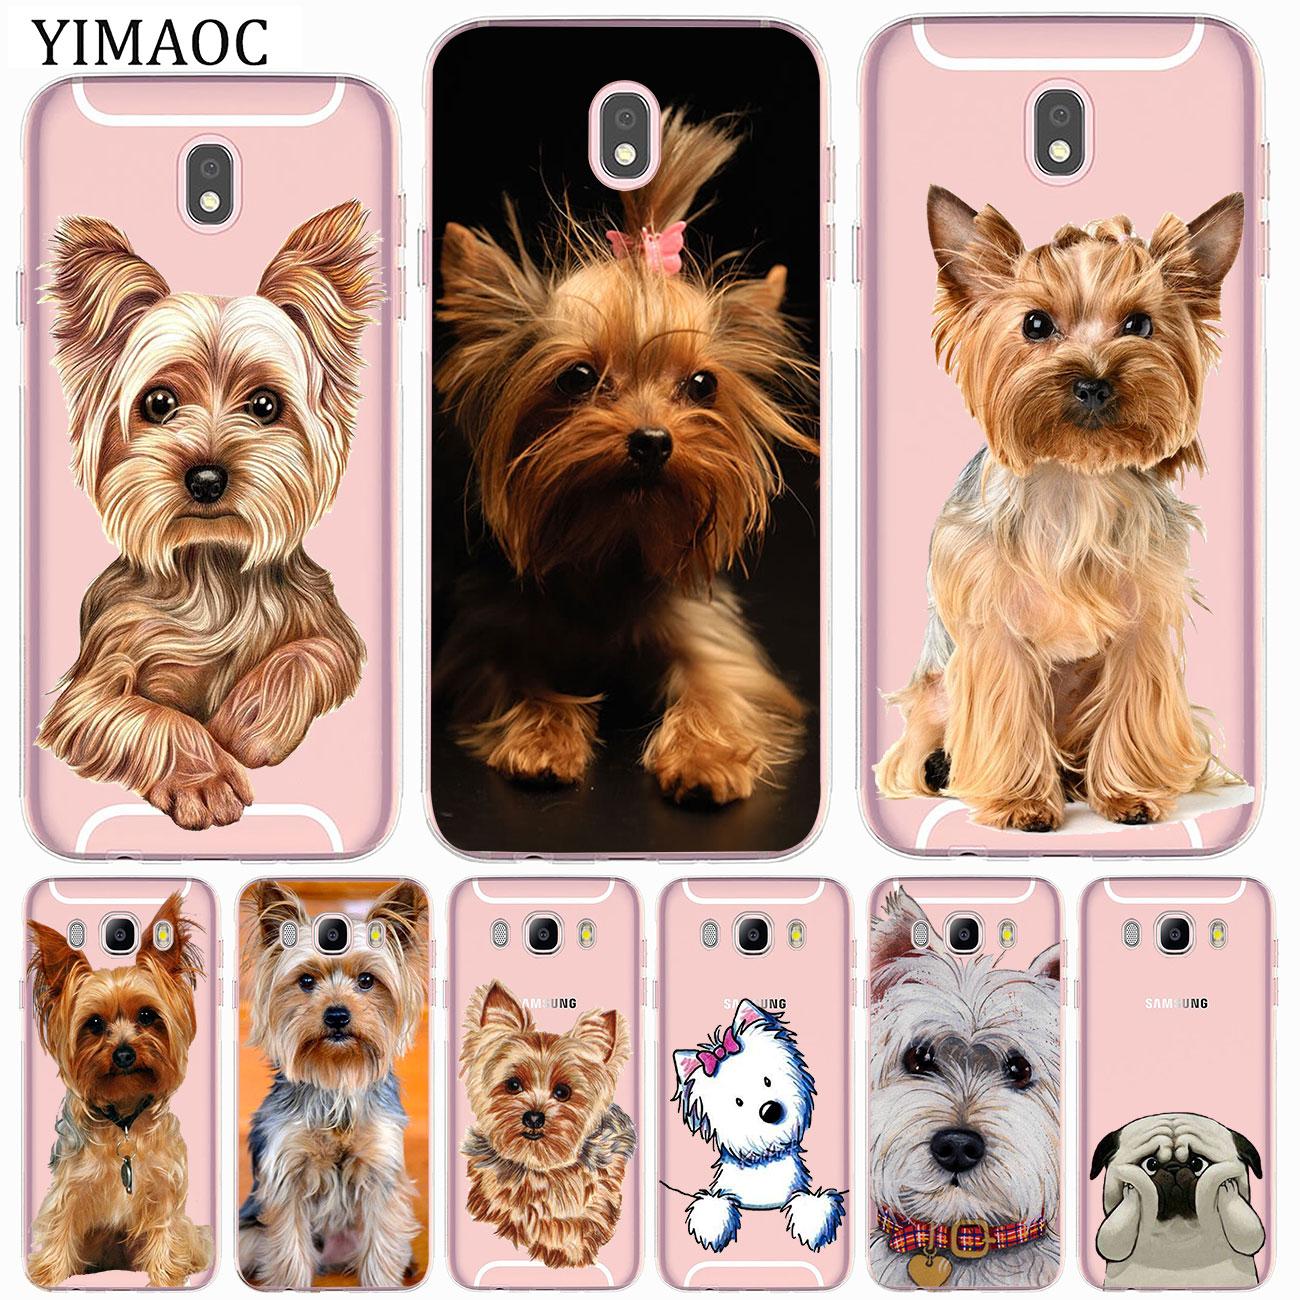 Funda suave para cachorro de yorkshire terrier, para Samsung Galaxy J8 J7...